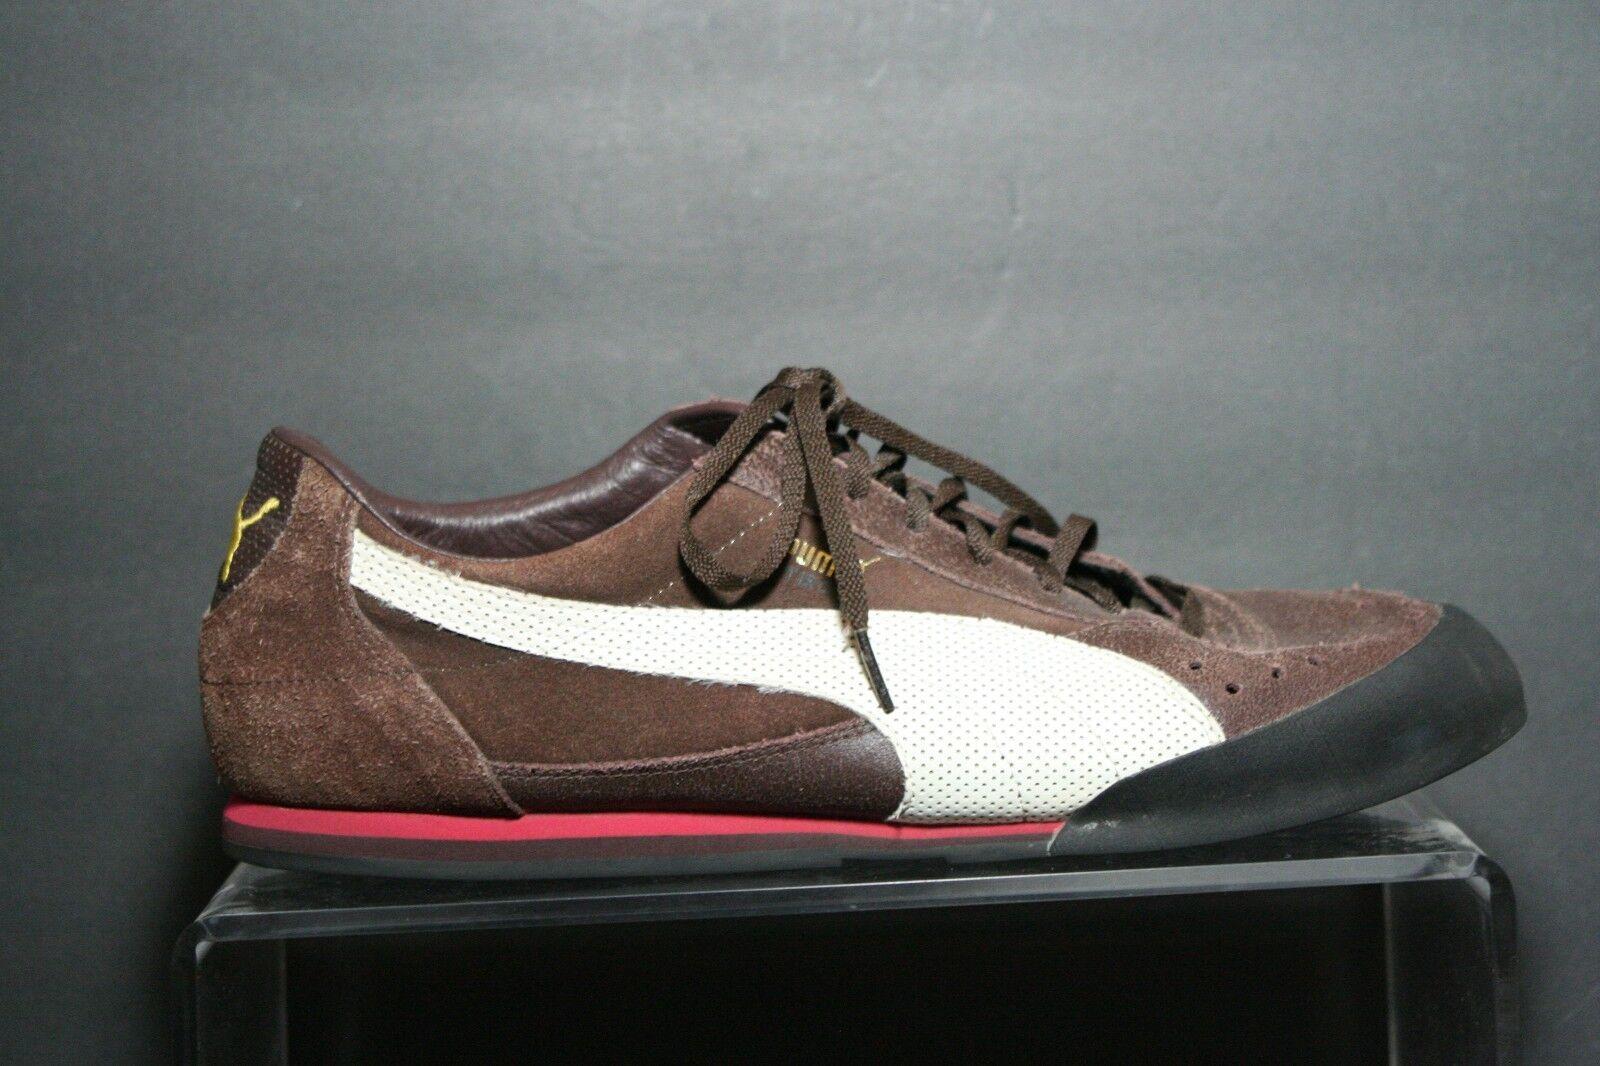 Puma Tiro II Low Retro Running Soccer Men 13 Multi Brown Athletic Suede Leather